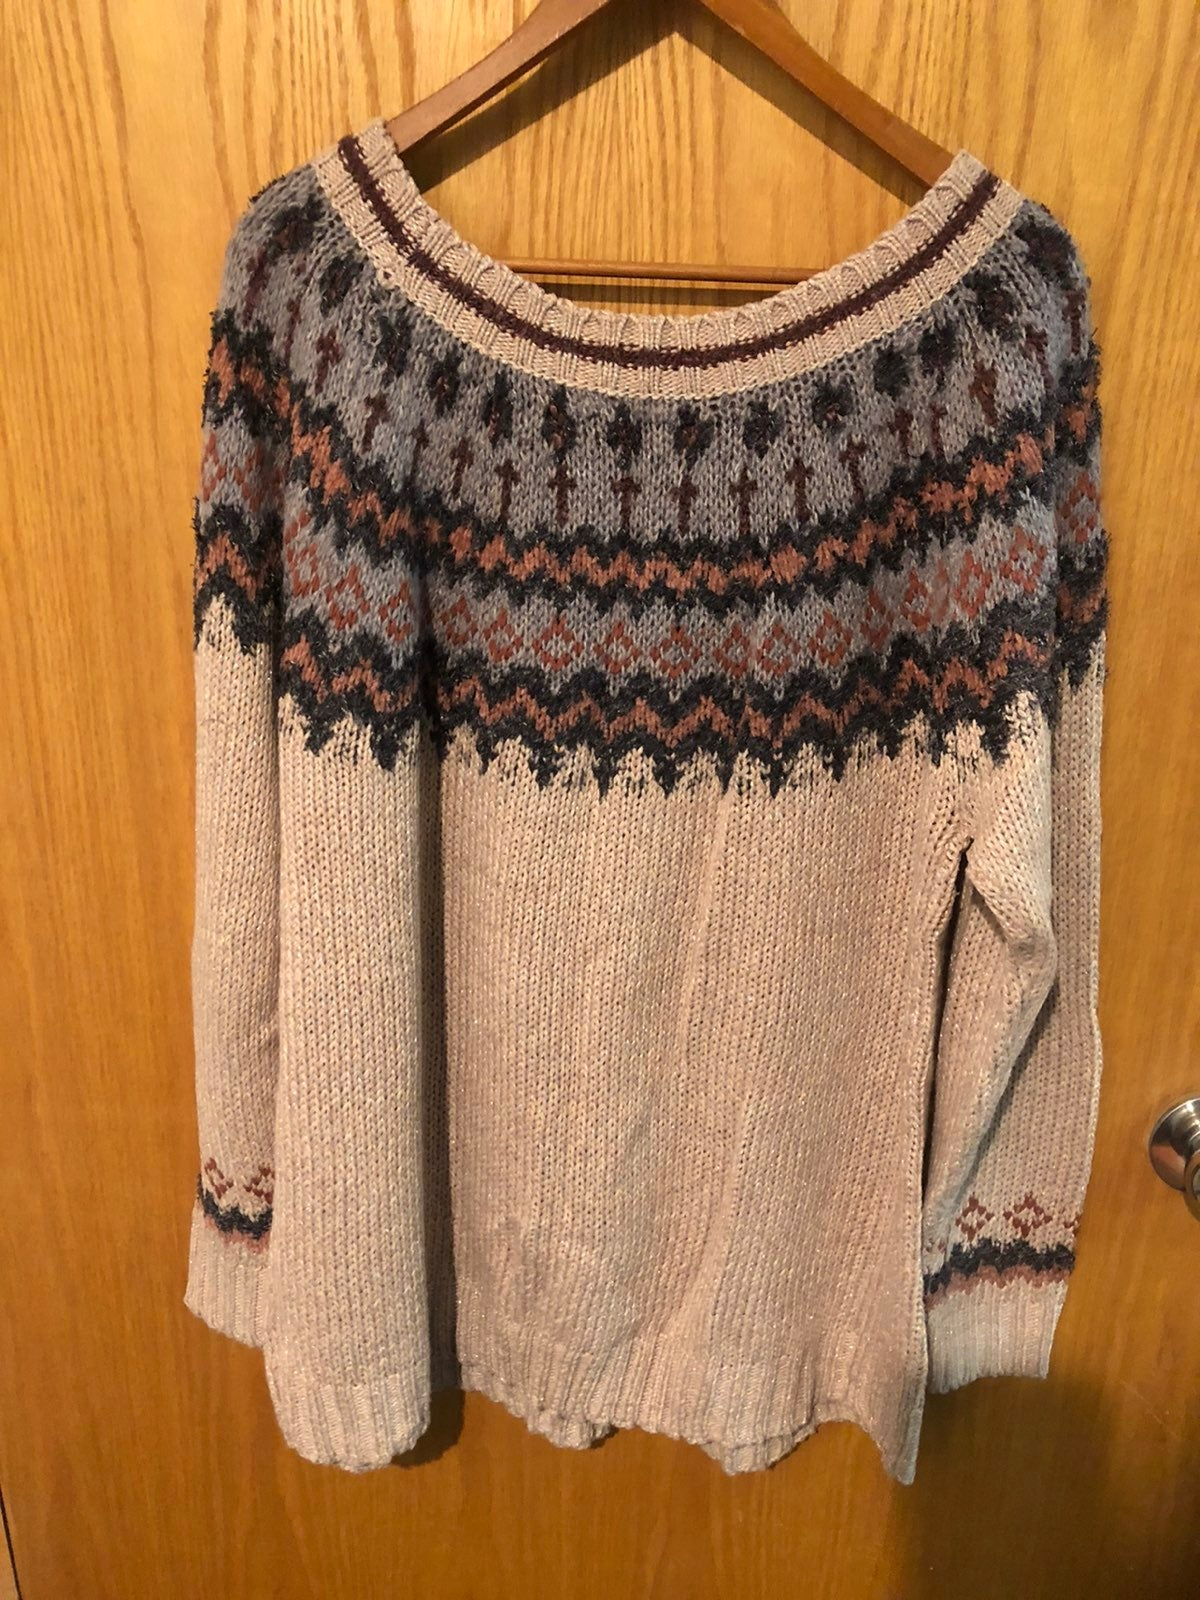 Maurices Fair Isle Sweater